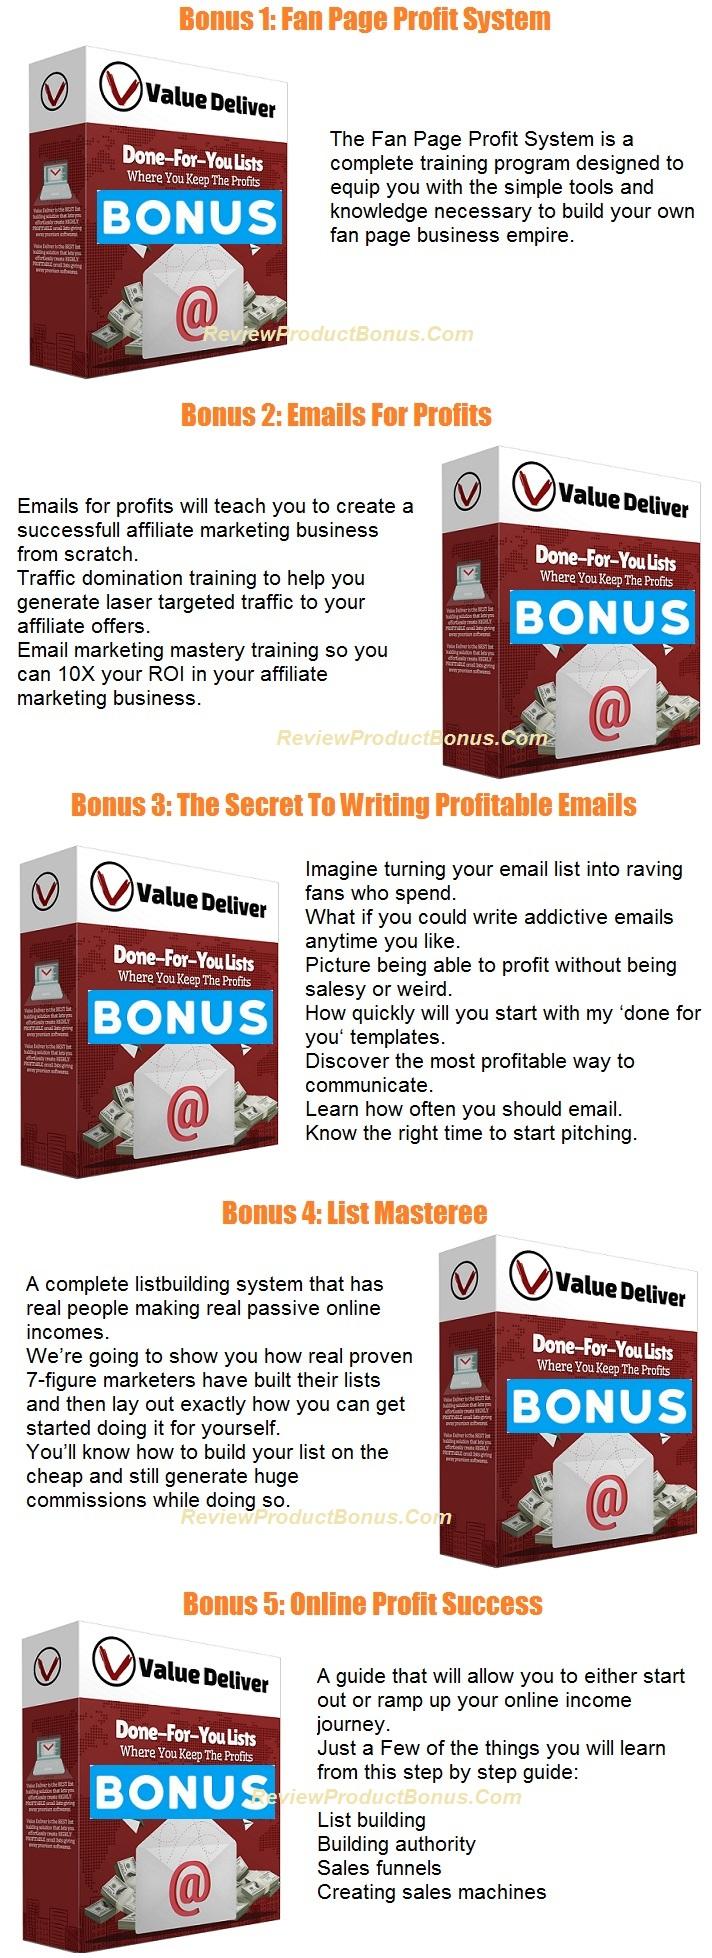 Value Deliver Bonus